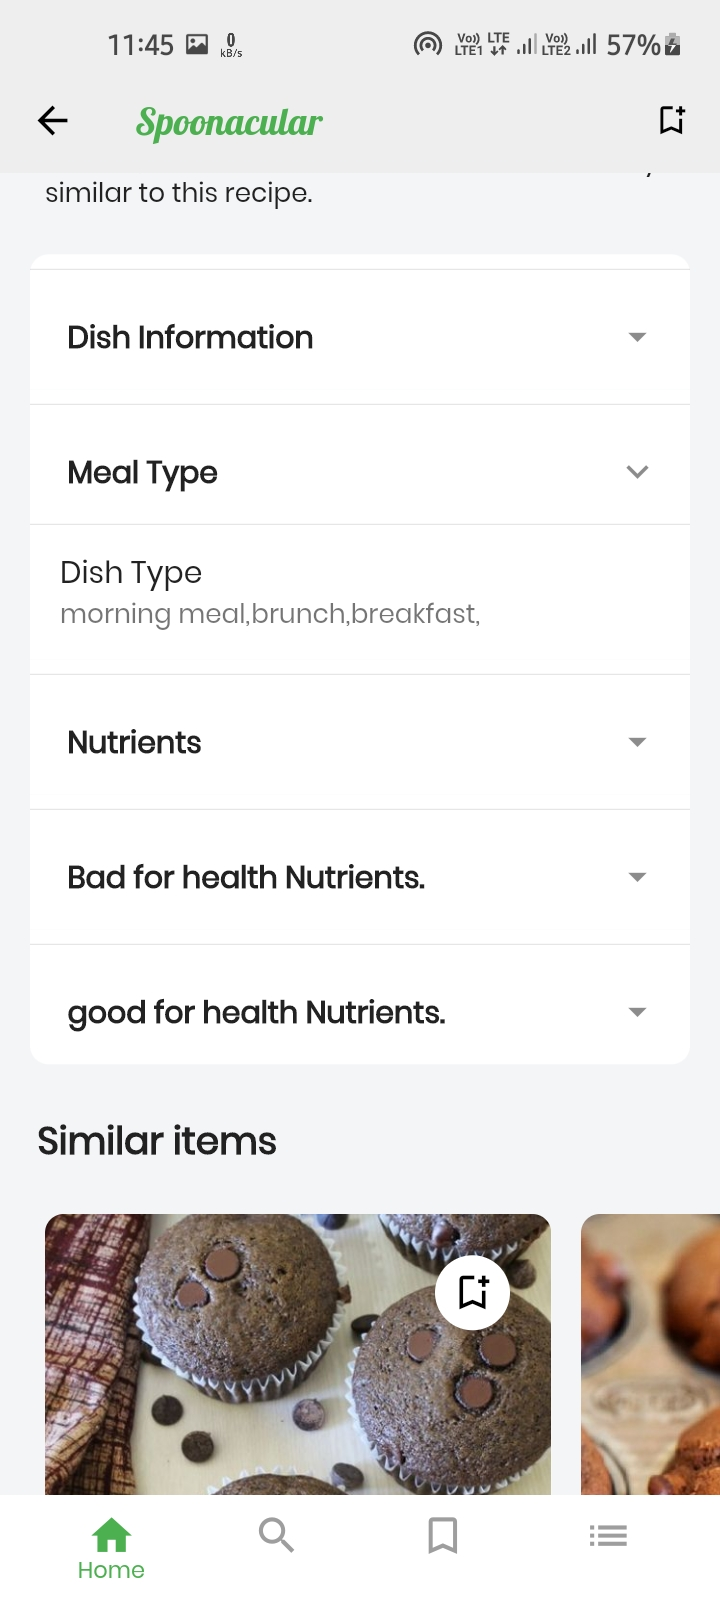 A Flutter Recipe app with spoonacular API